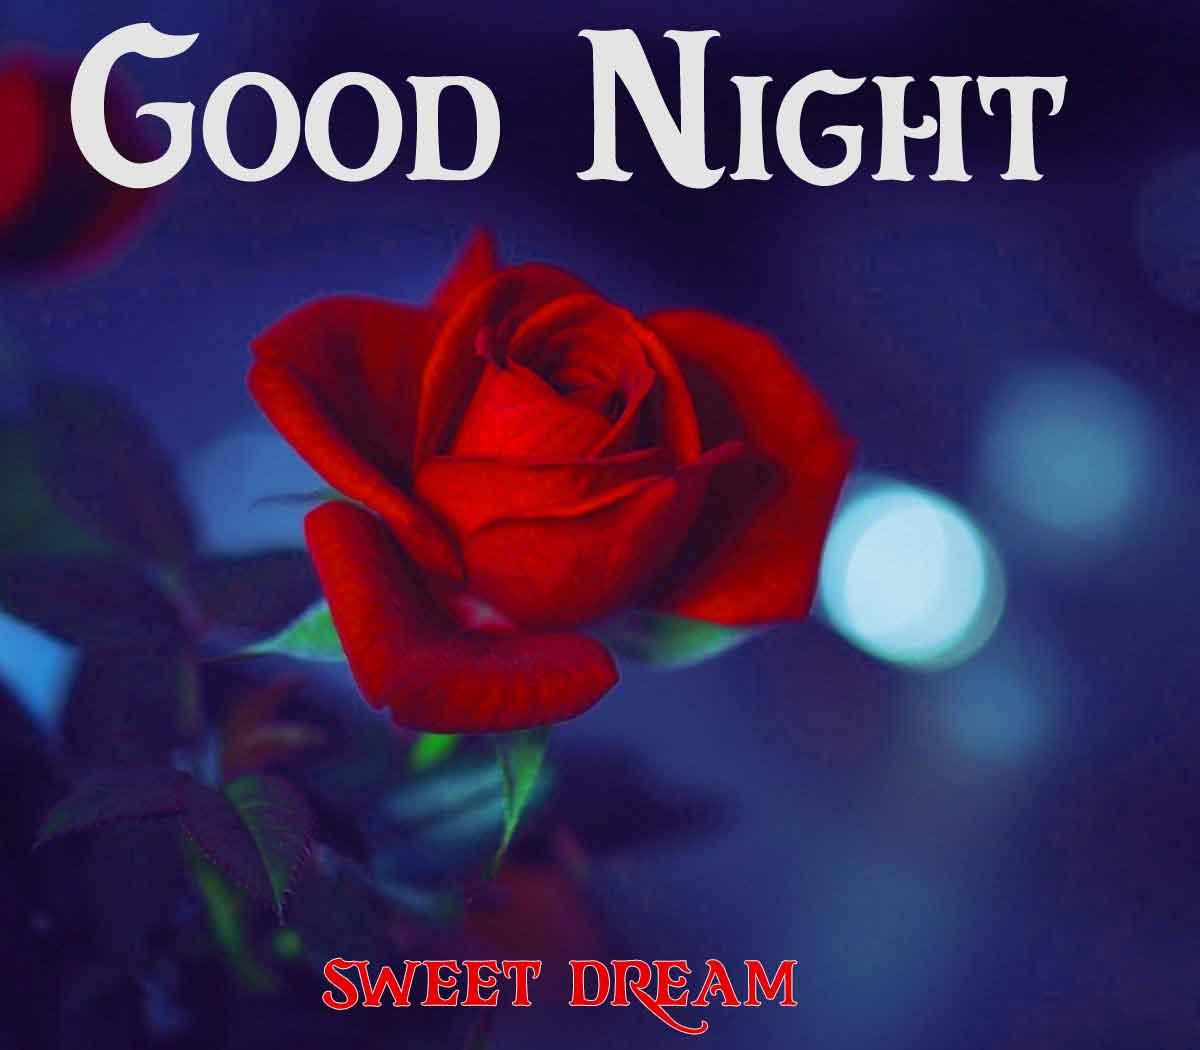 rose Good Night wallpaper